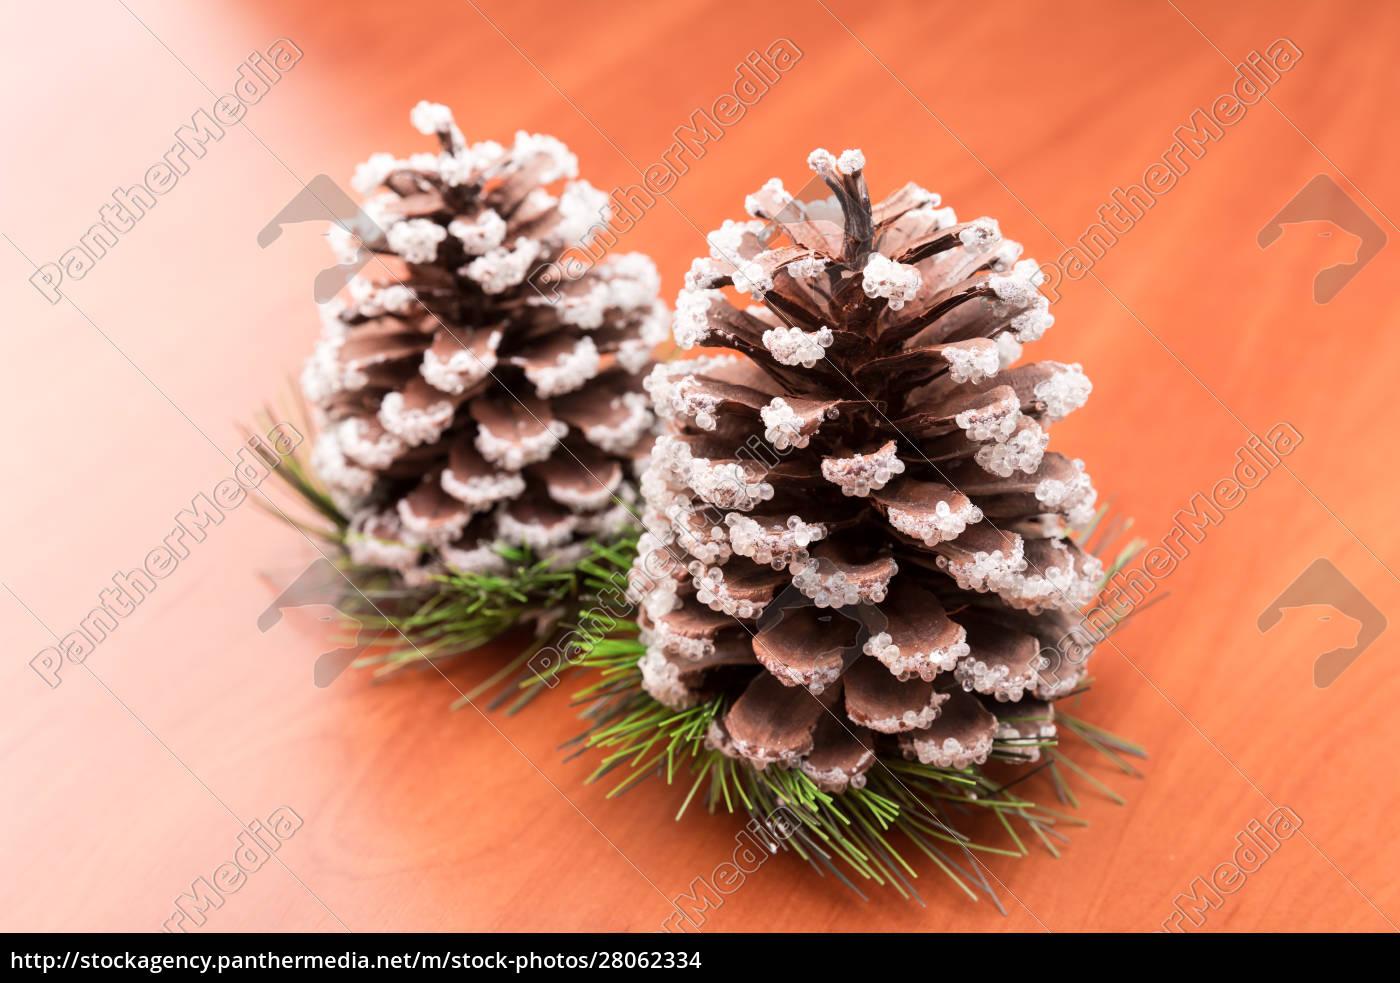 fir, cones - 28062334